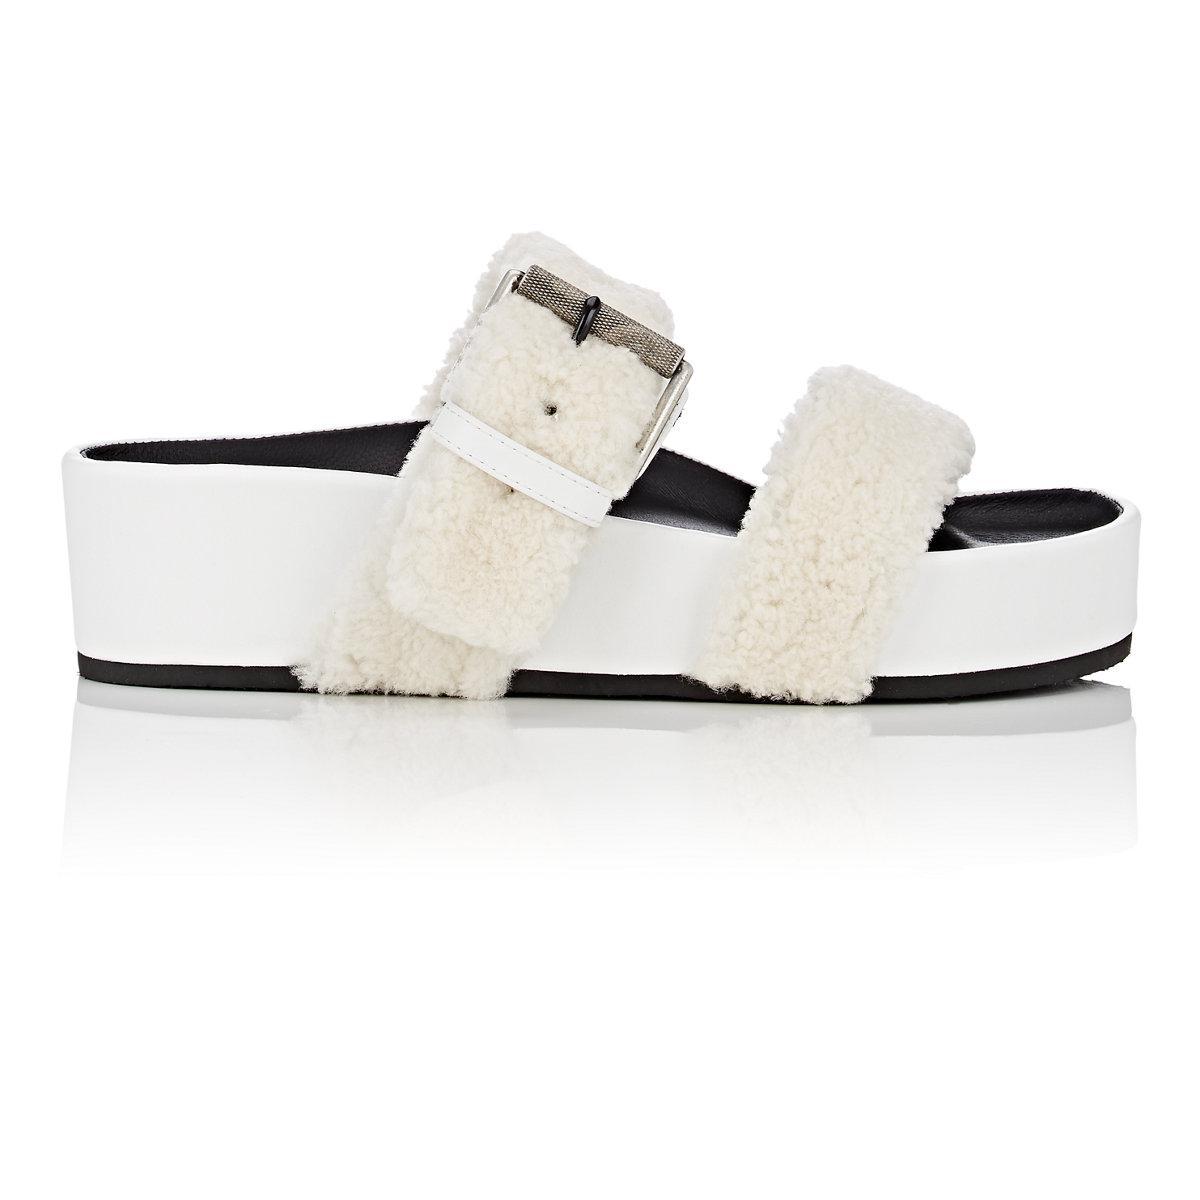 c6191173f60a Lyst - Rag   Bone Evin Shearling Platform Slide Sandals in White